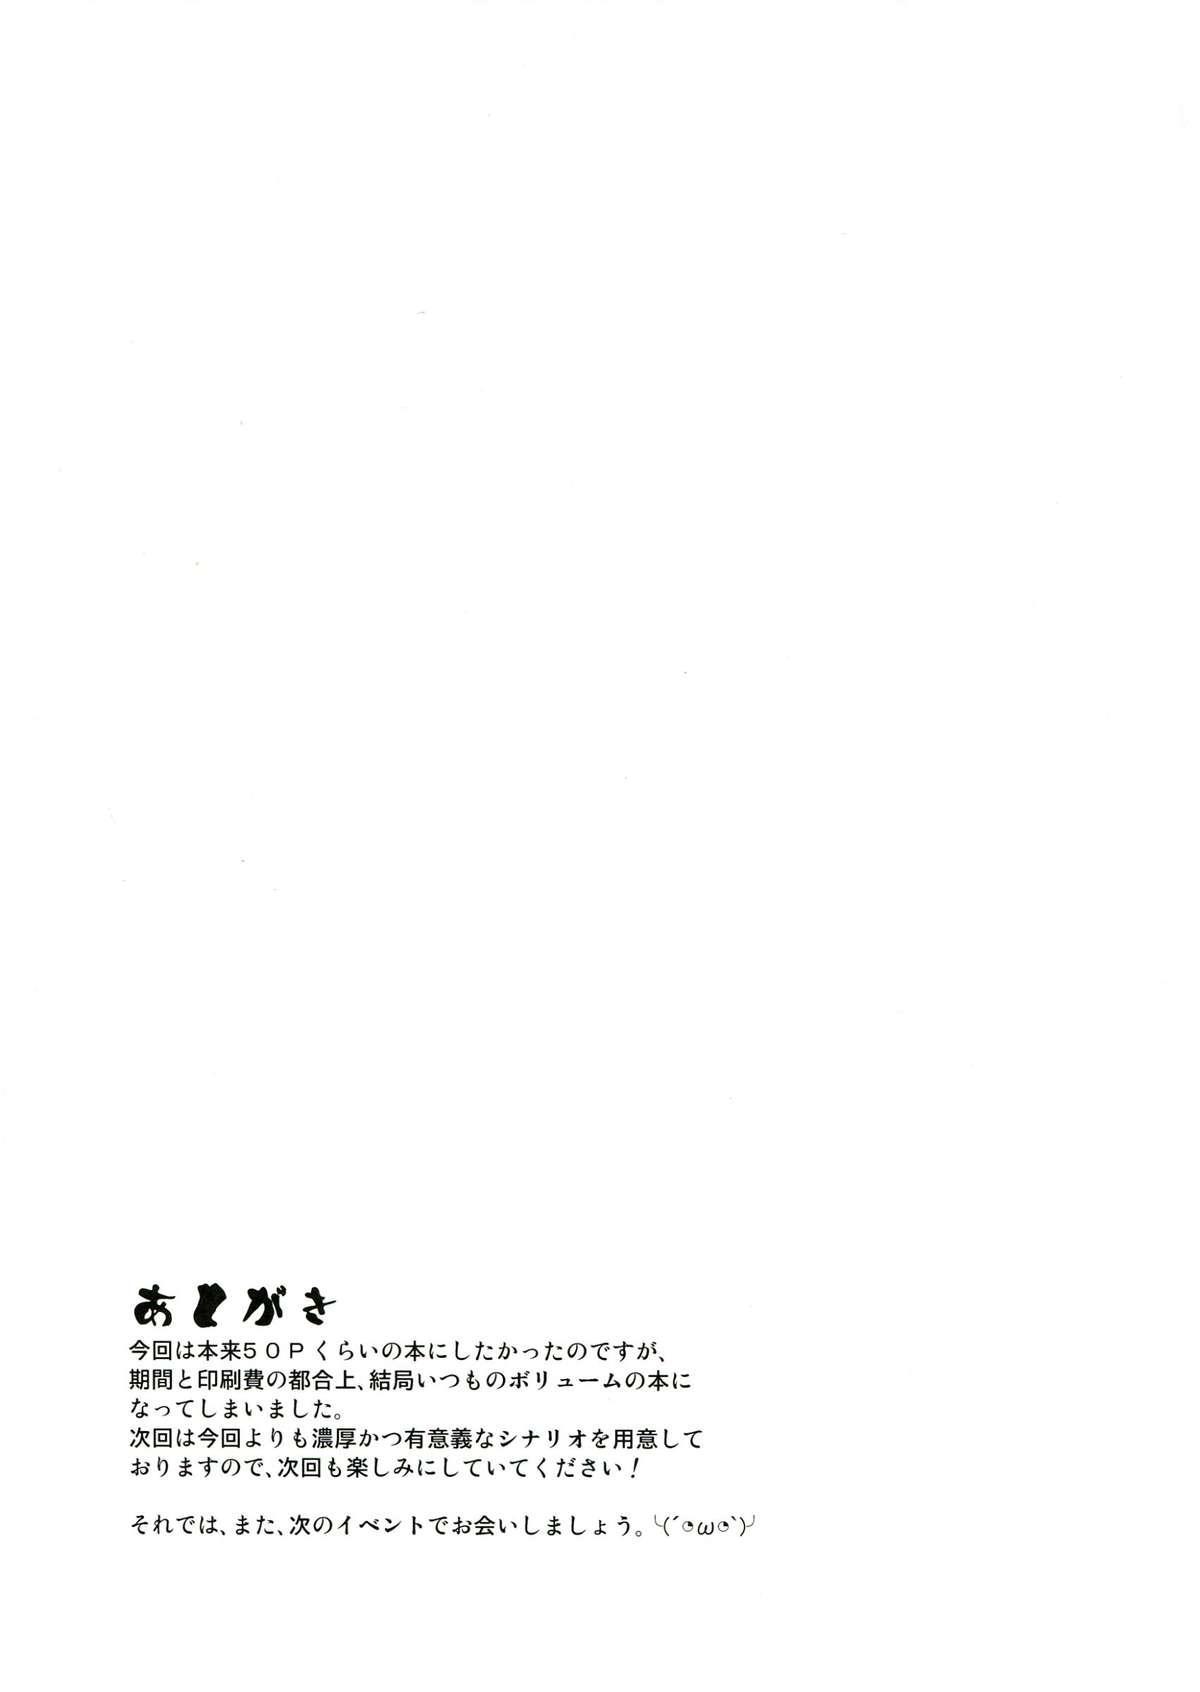 Gensou Saichin Monogatari 24